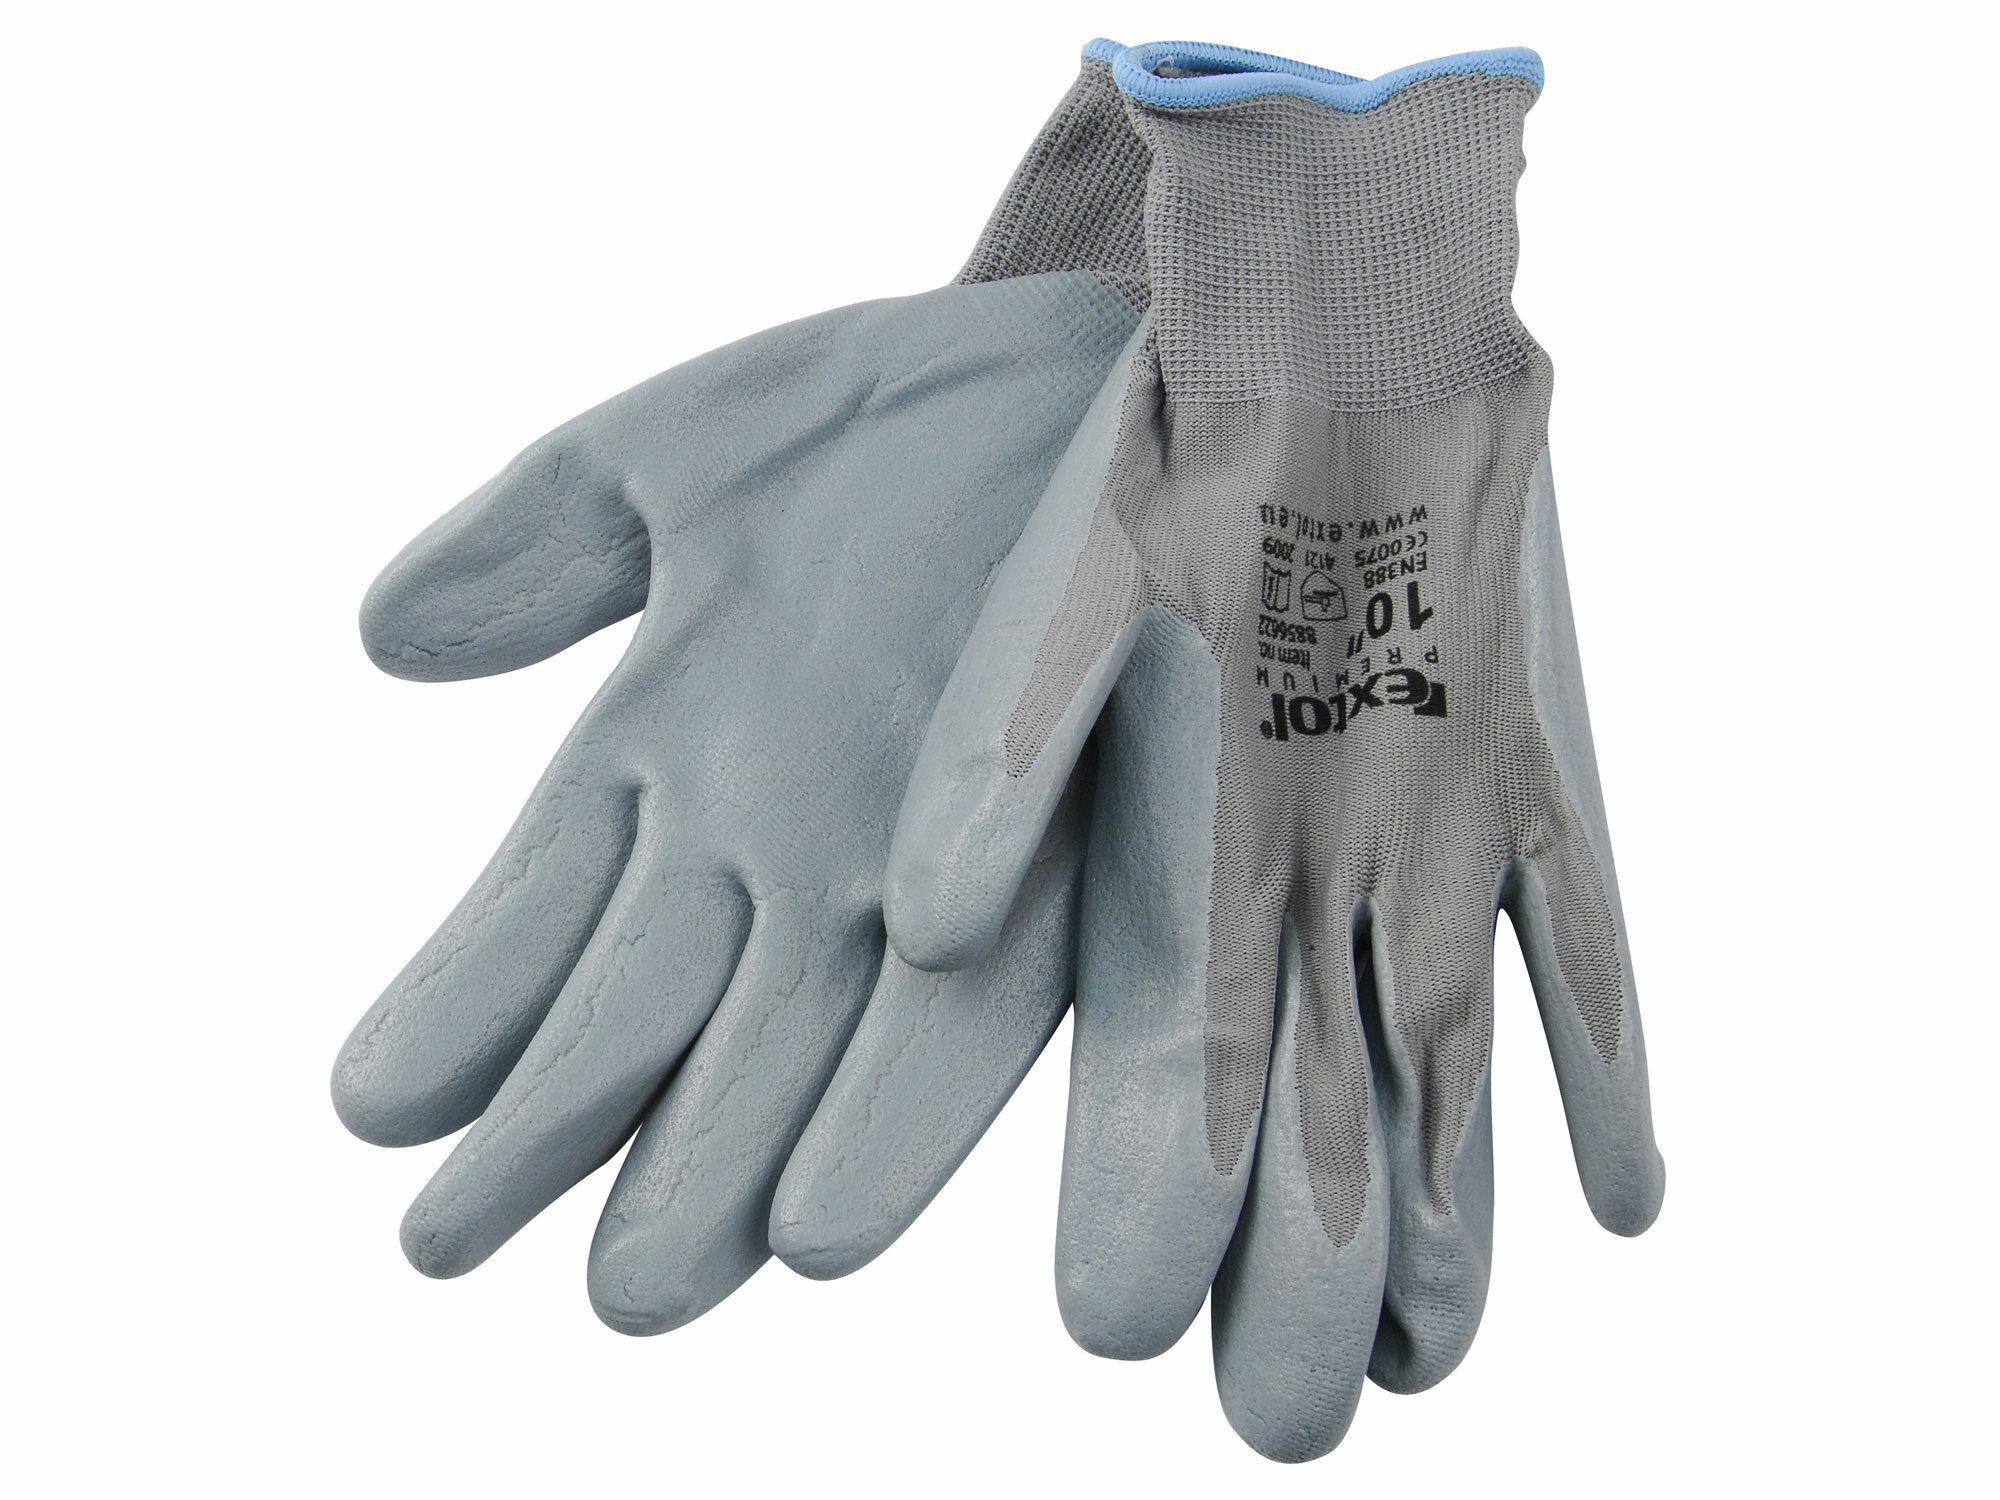 "Rukavice nylonové polomáčené v nitrilu, S/8"", velikost S/8"" EXTOL-PREMIUM"